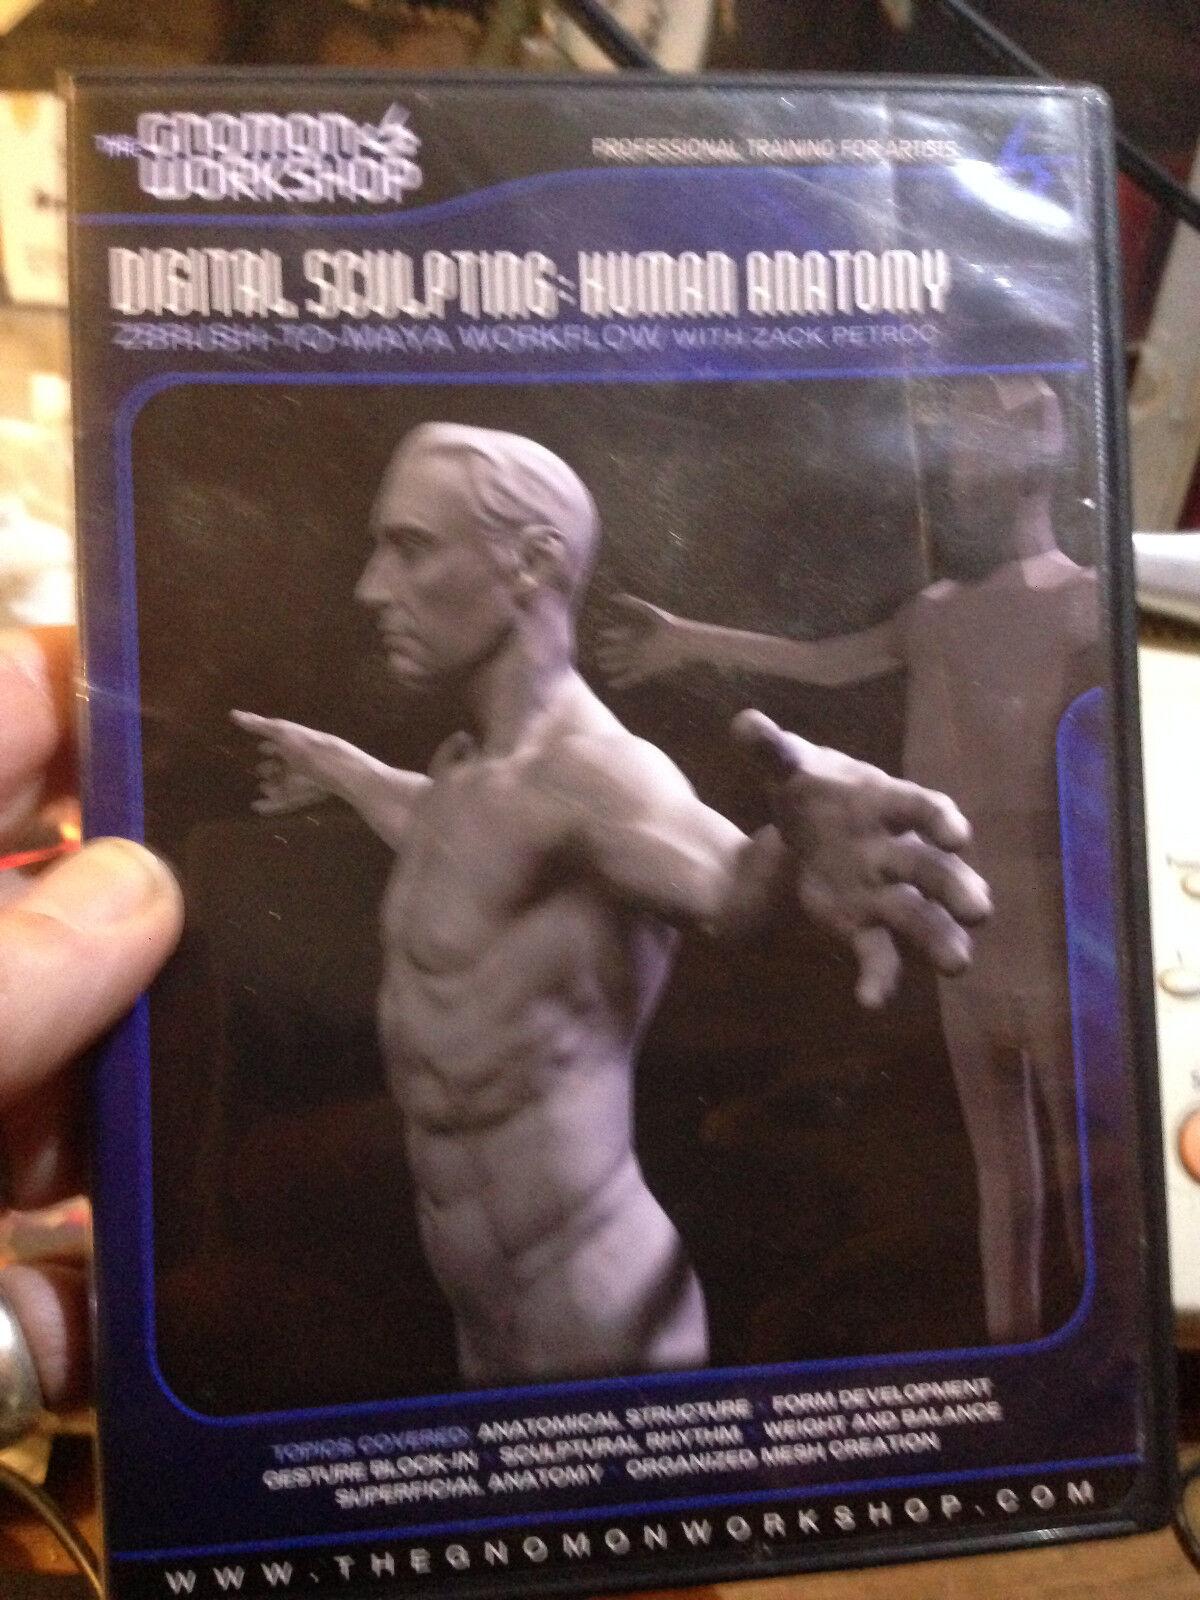 Gnomon Workshop DVD Digital Sculpting Human Anatomy ZBrush to Maya ...